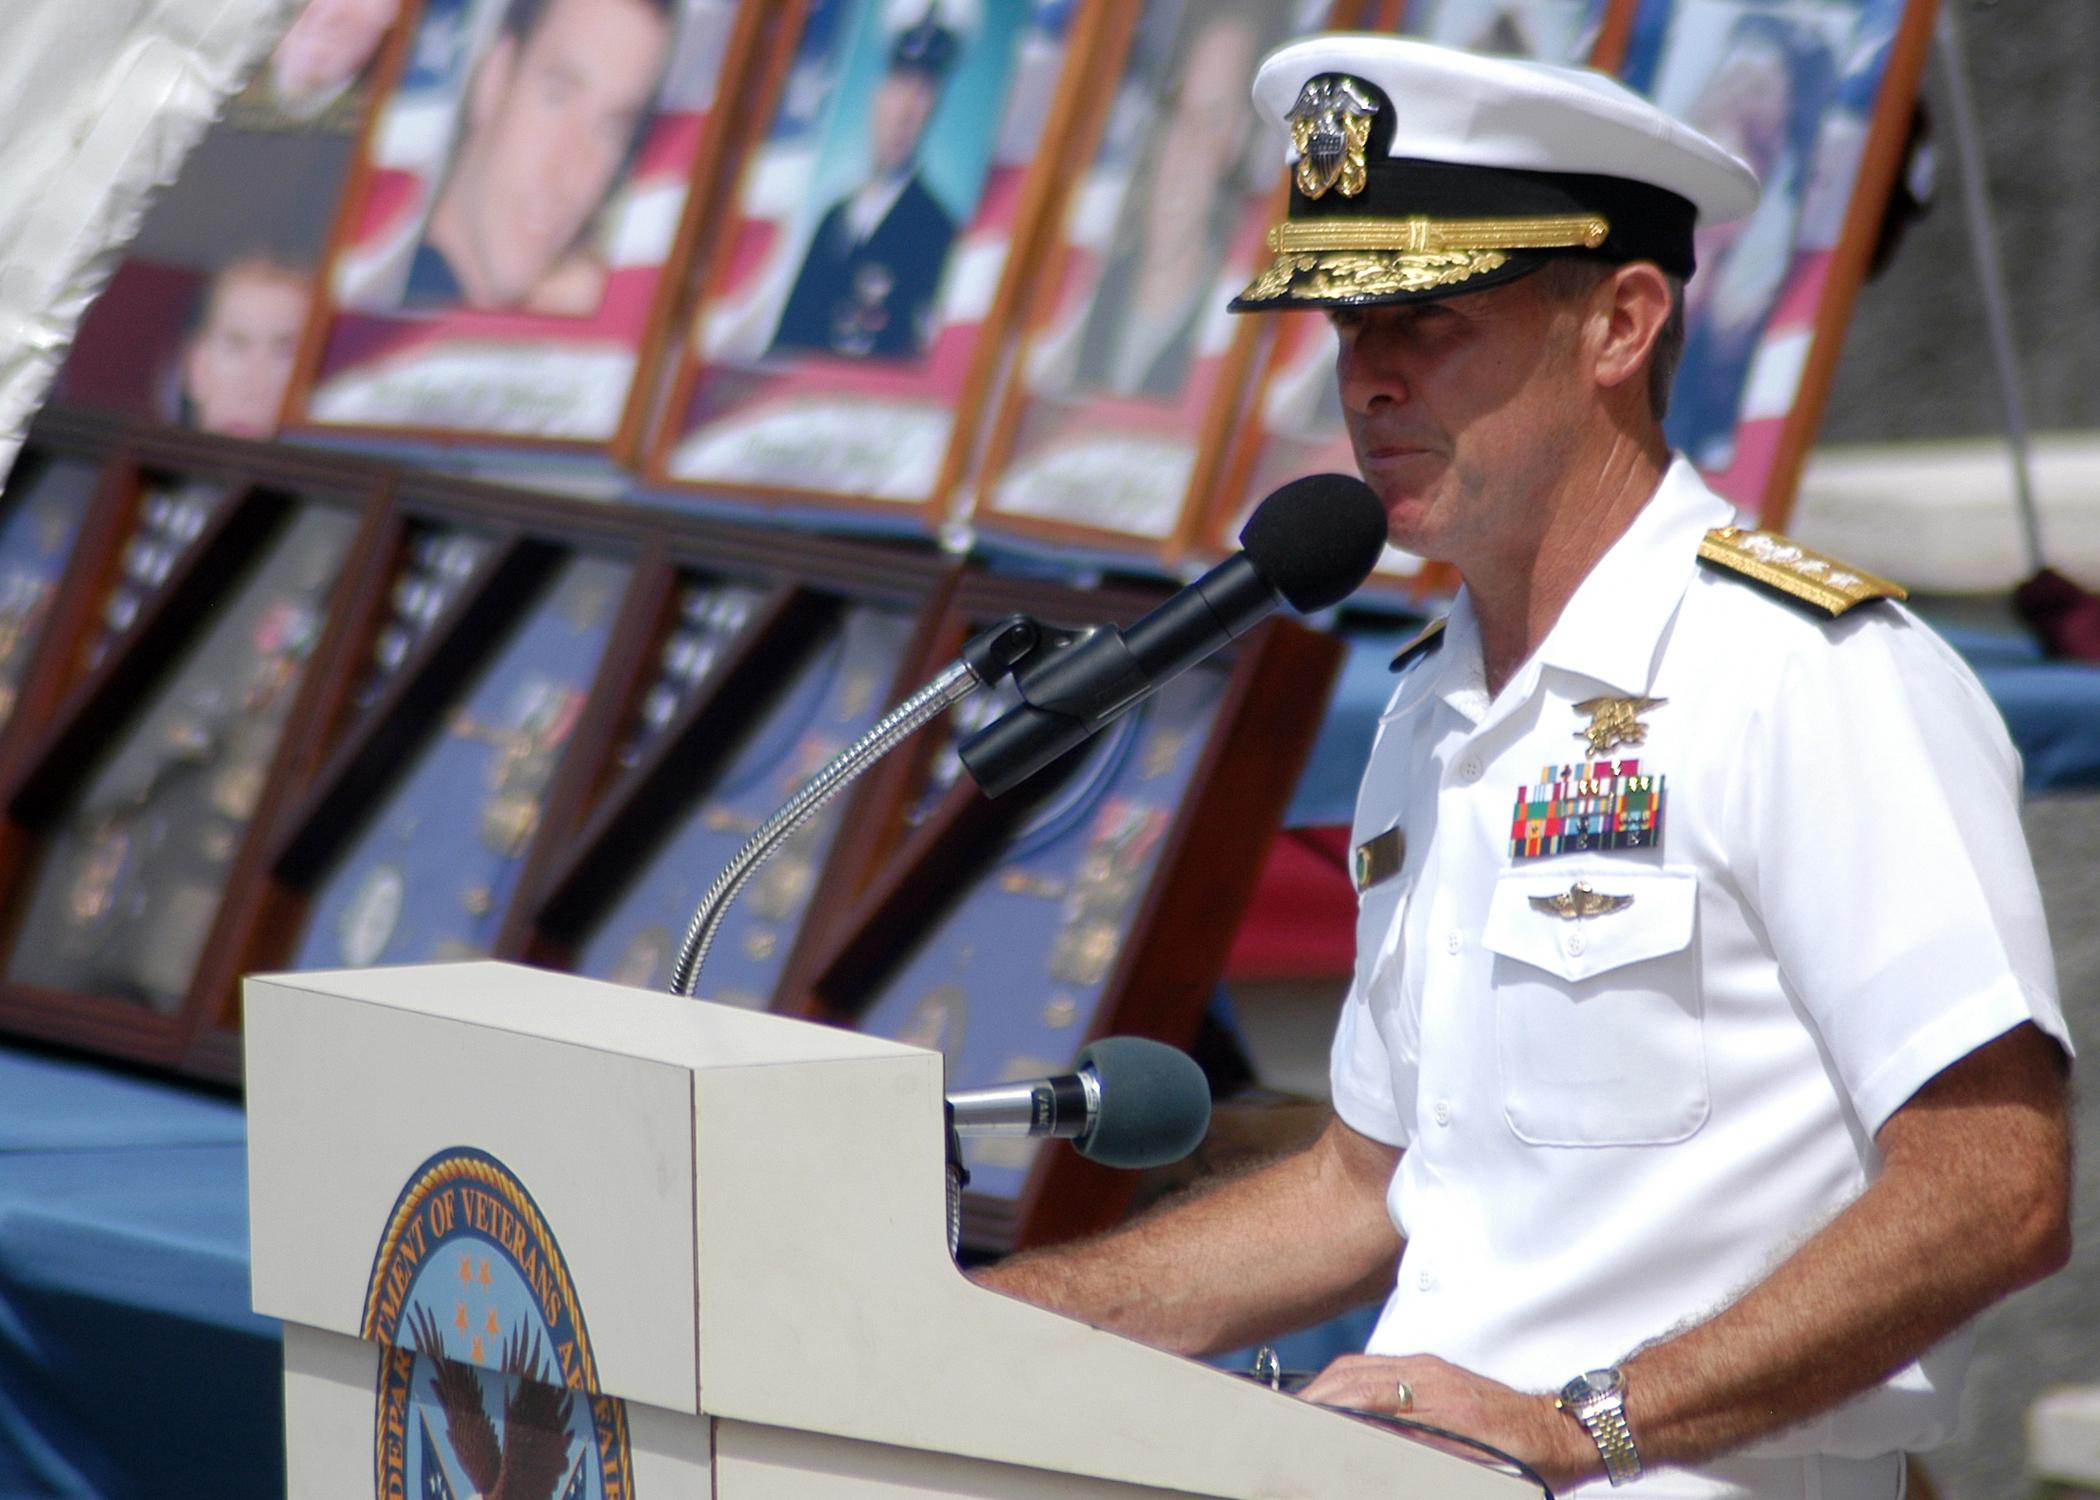 File:US Navy 050711-N-3019M-006 Commander, Naval Special Warfare ...